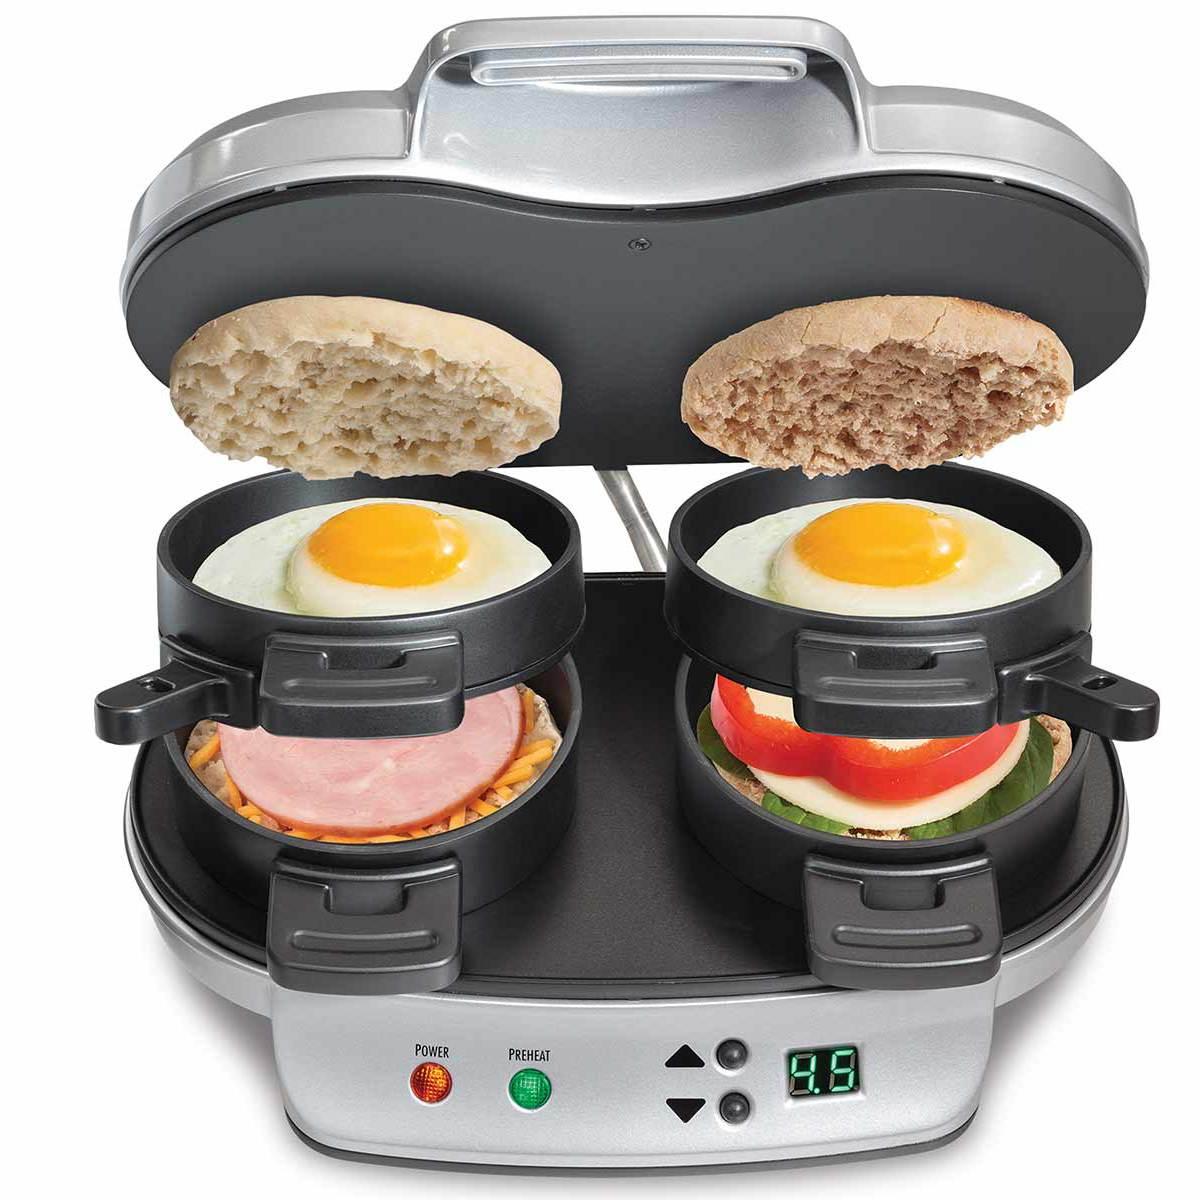 Hamilton Beach Dual Sandwich Maker: Men Can Cook!